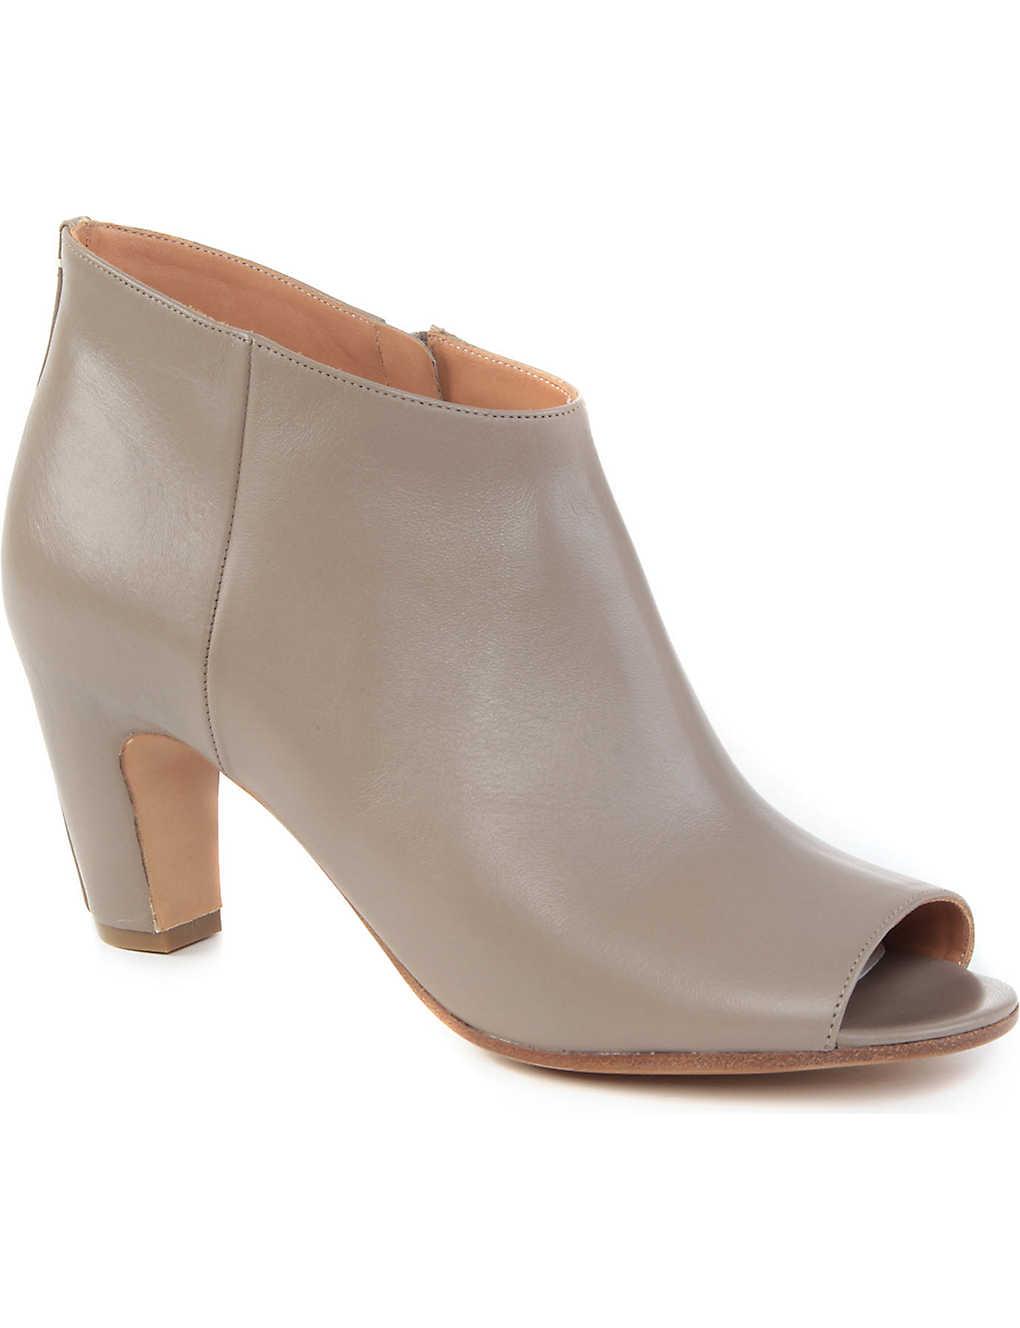 09114844b53f MAISON MARGIELA - Banana heel leather boots